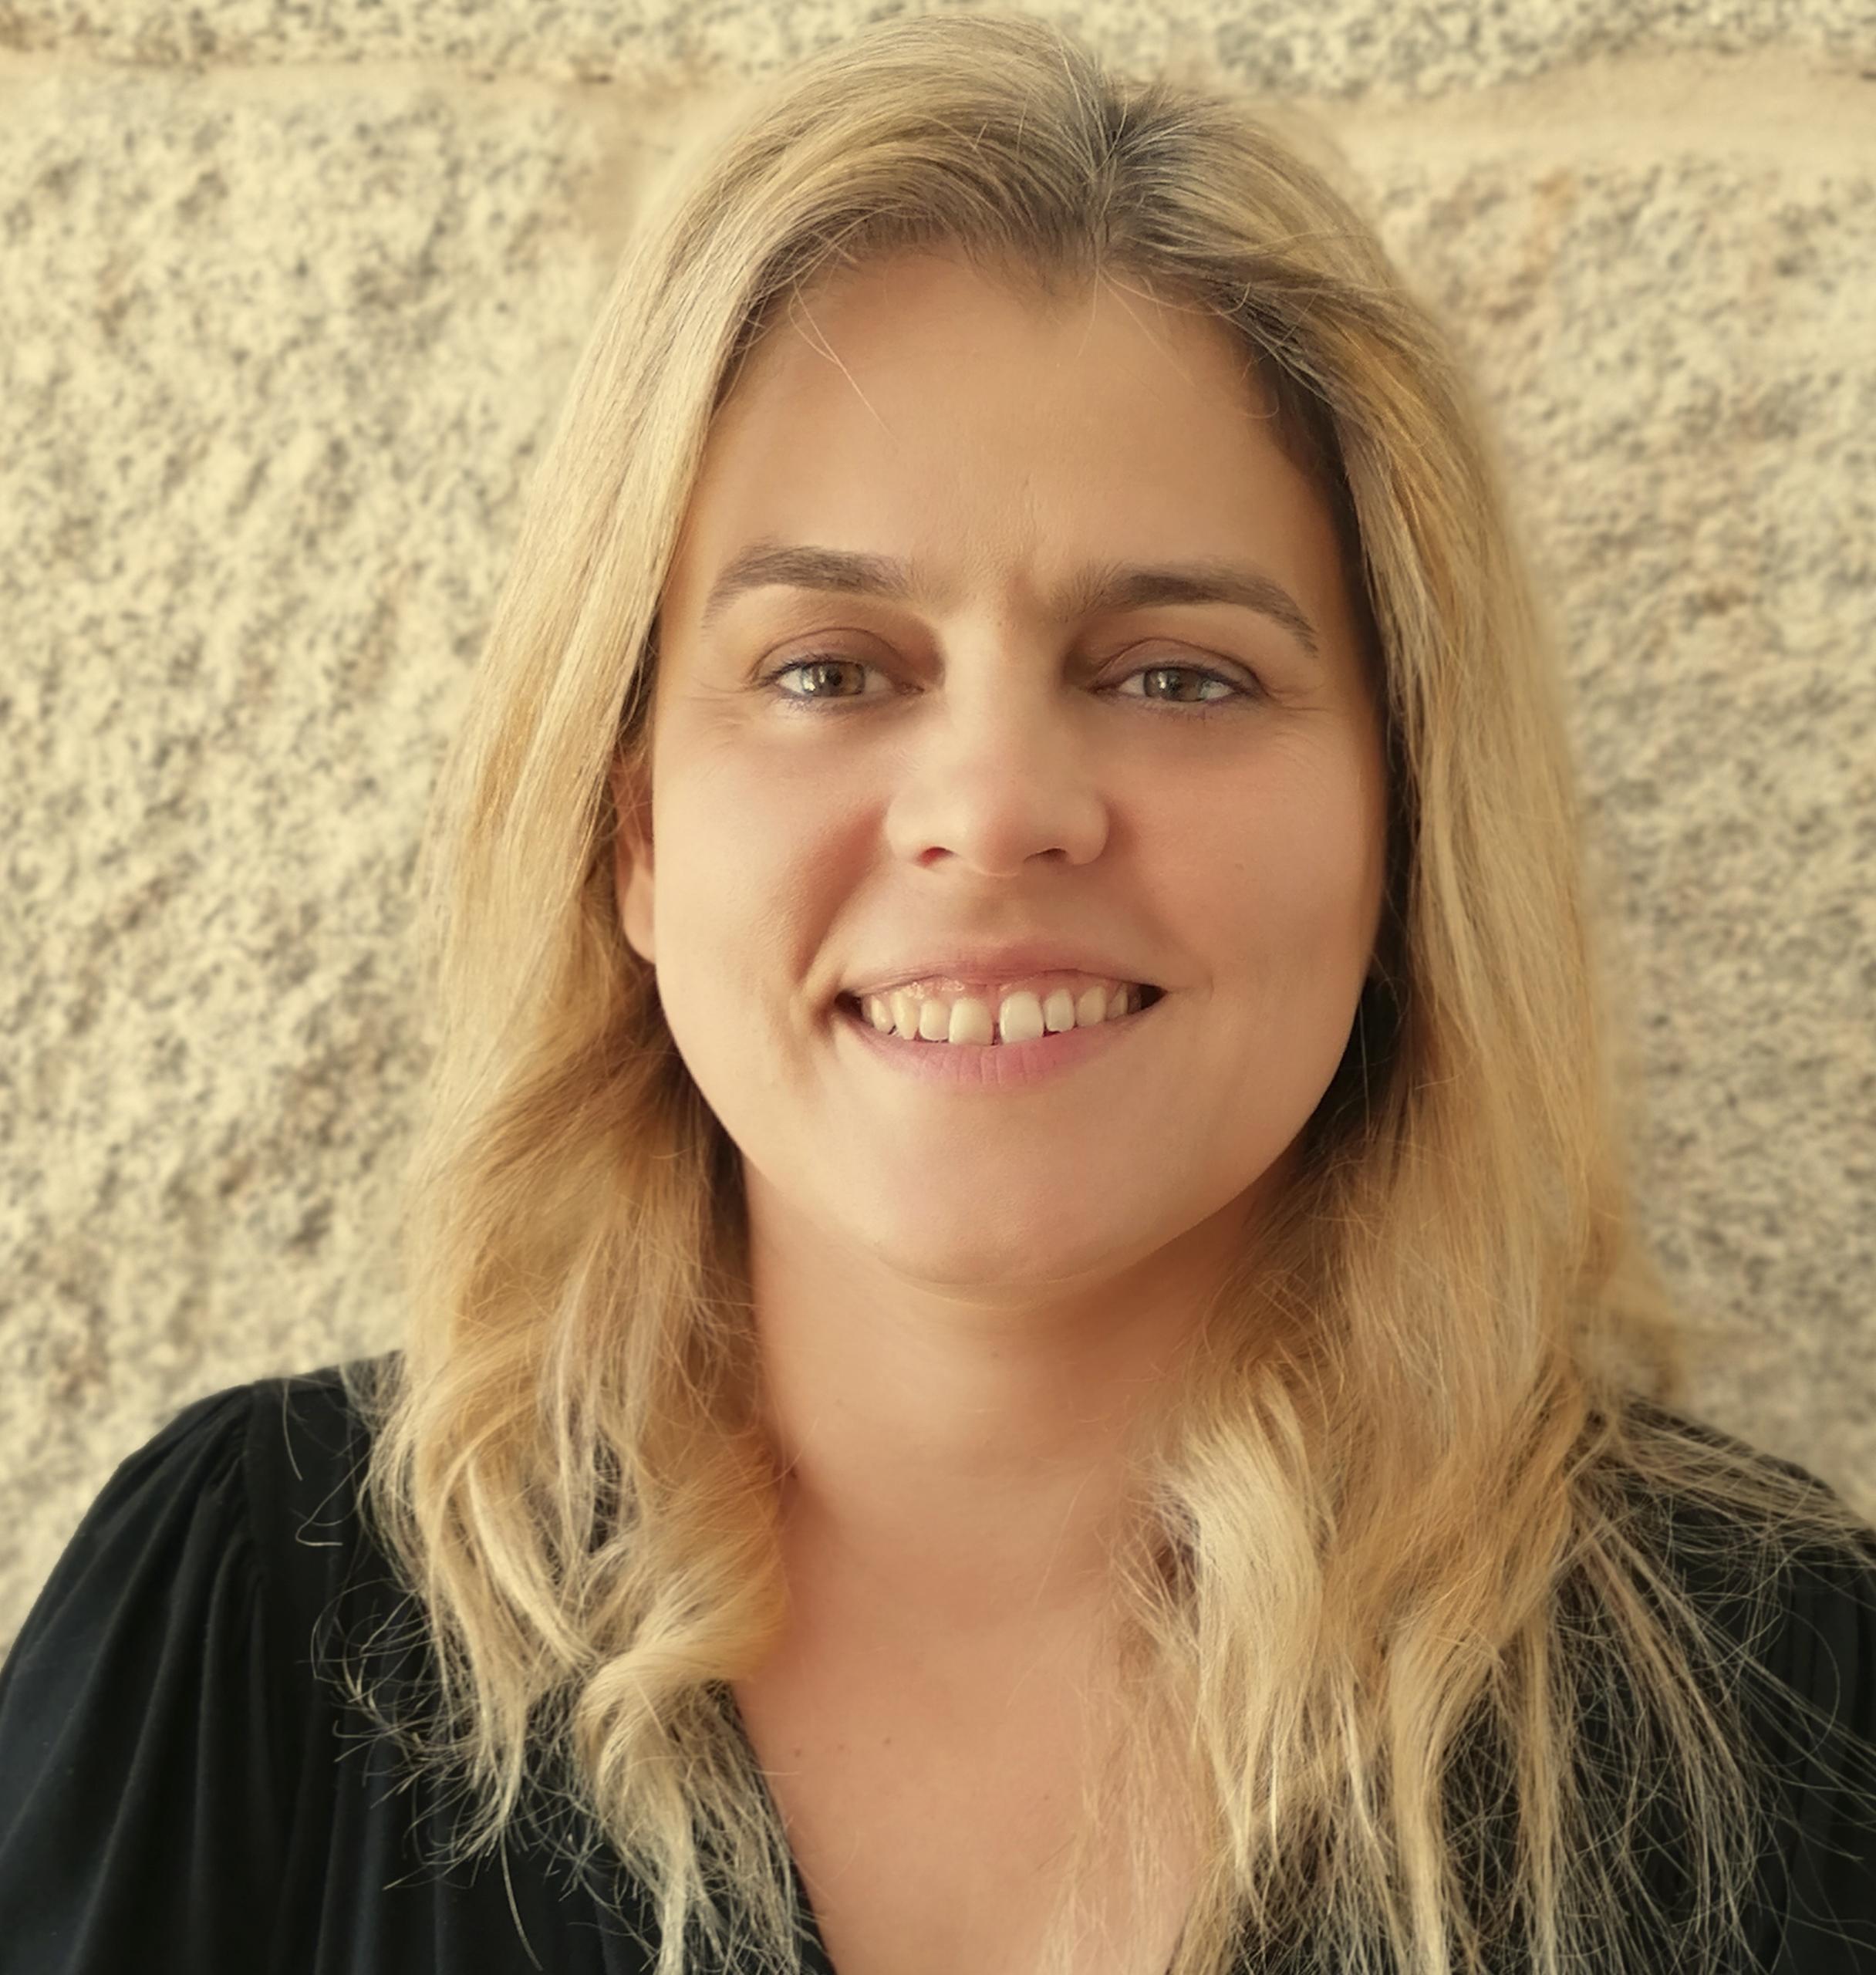 Vanesa Regengo - Escenógrafa e arquitecta